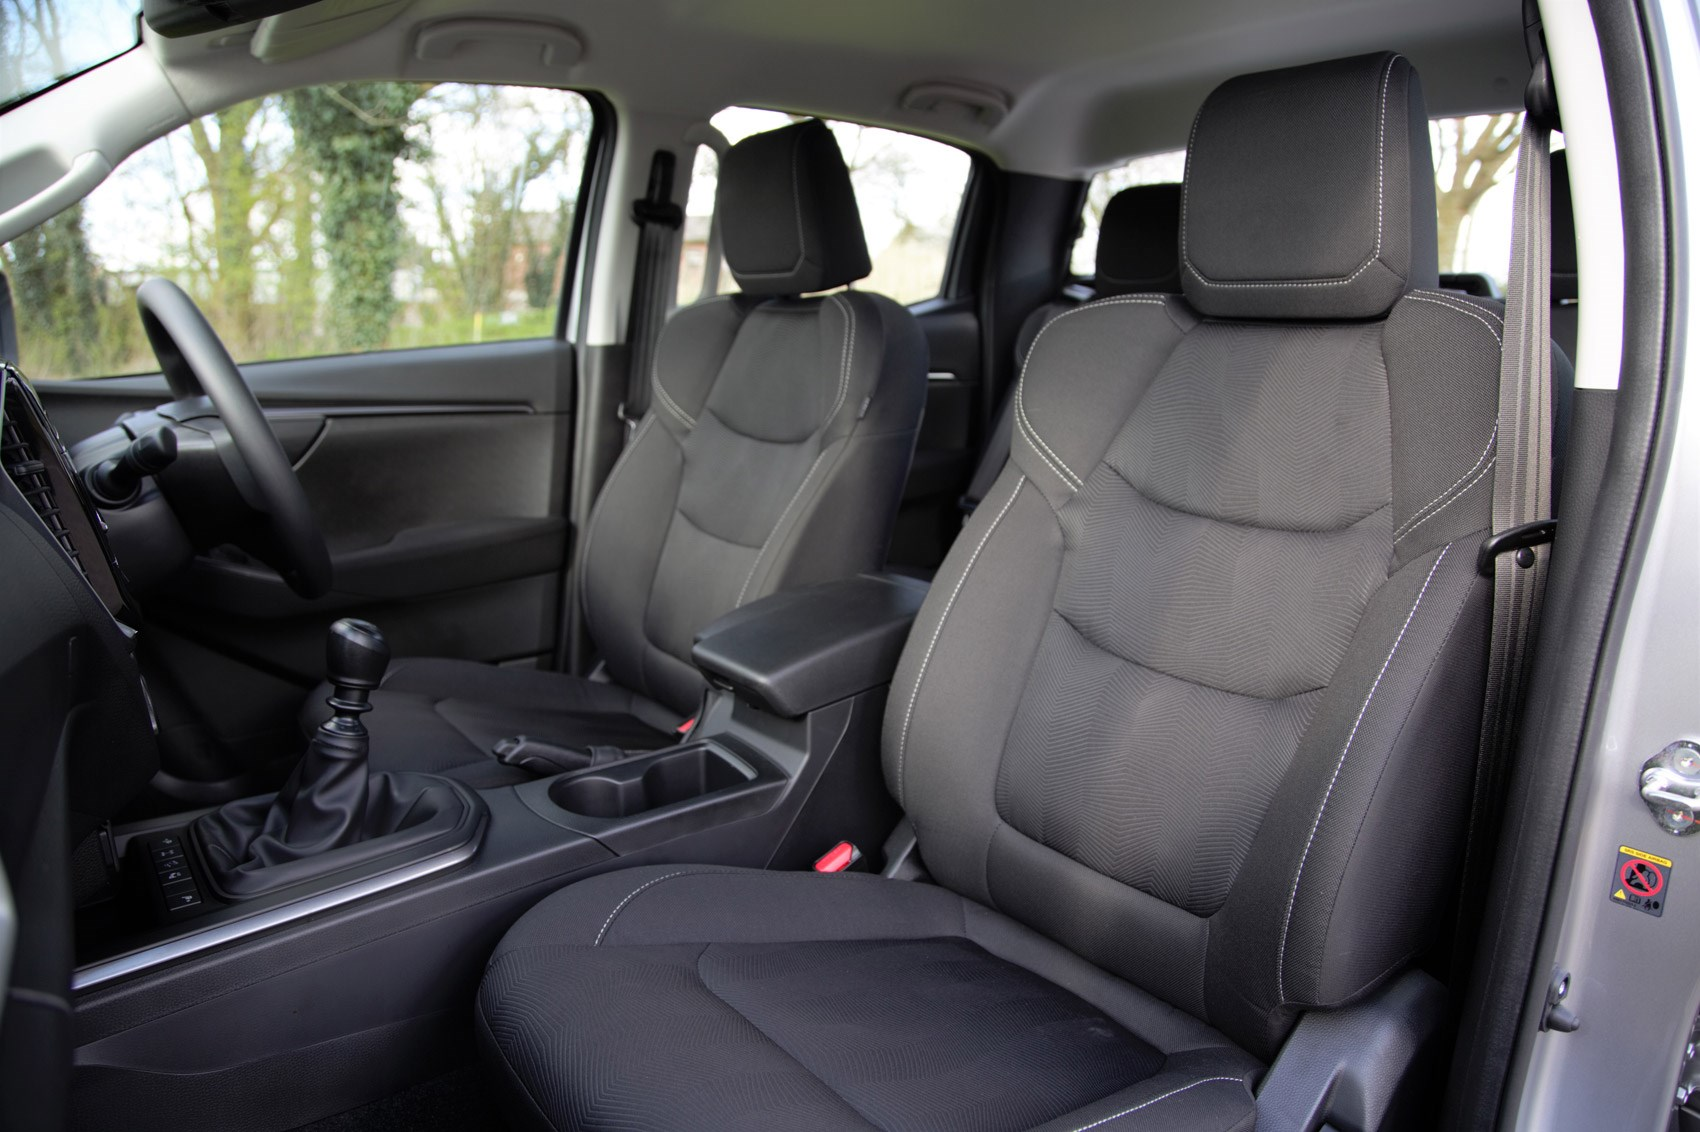 Isuzu D-Max review, 2021, DL20 front seats